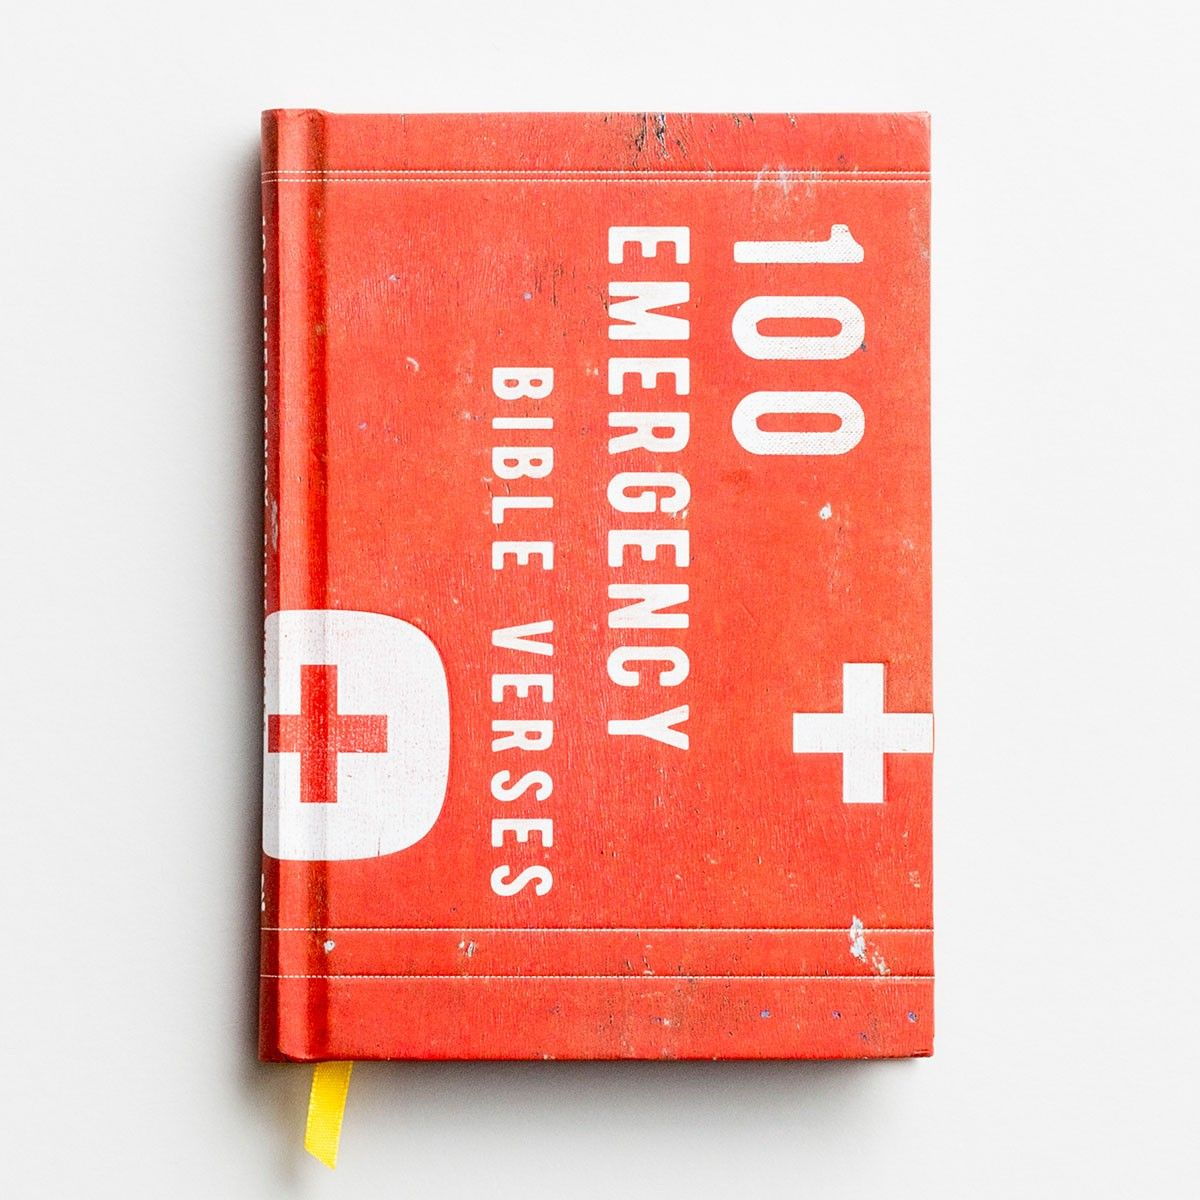 100 Emergency Bible Verses - Devotional Gift Book | Verses, Bible ...